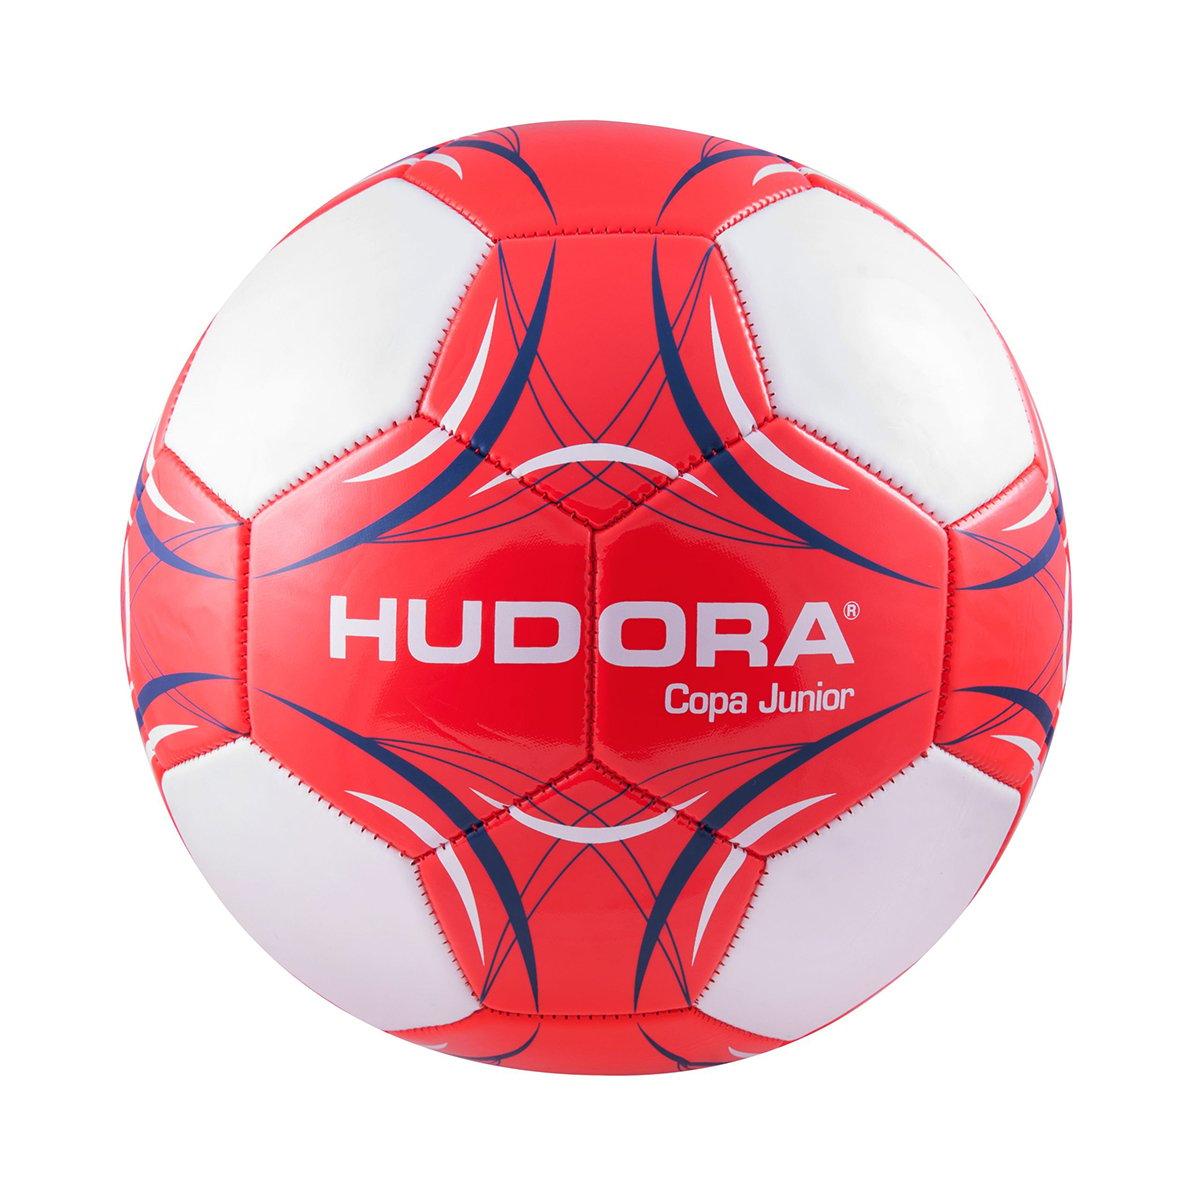 Minge de fotbal, Hudora, Cupa junior, marimea 5